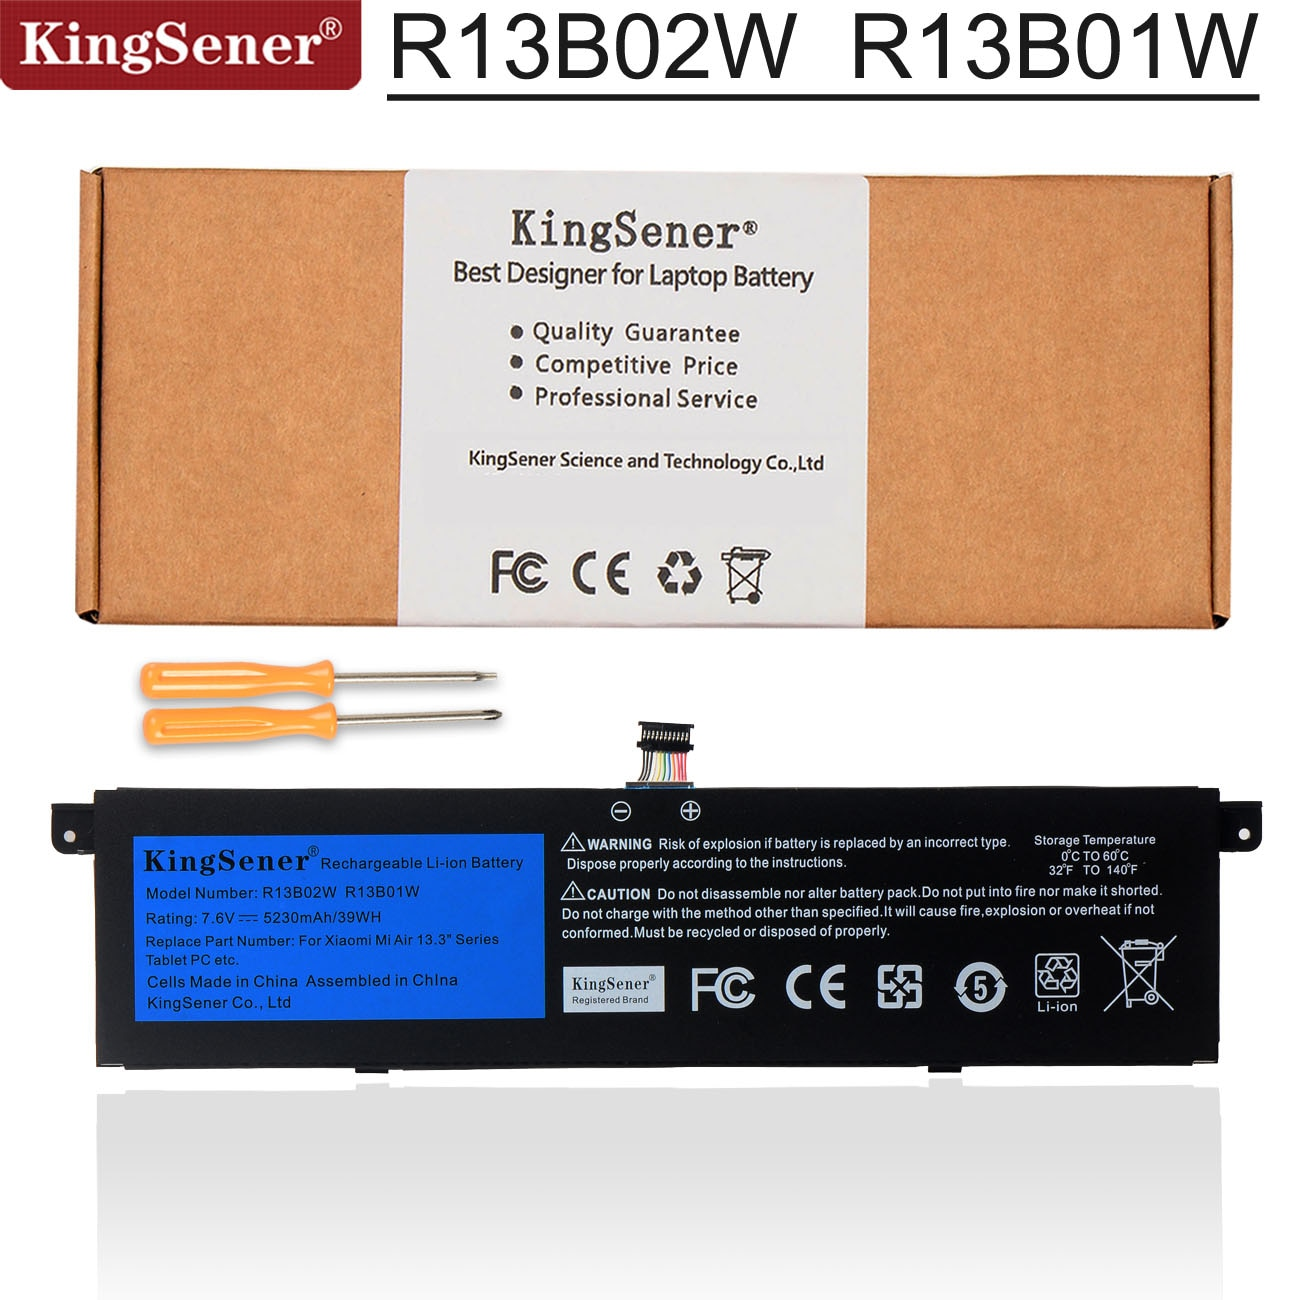 Kingsener-بطارية الكمبيوتر المحمول 7.6 فولت ، 5230 مللي أمبير ، R13B01W R13B02W ، لسلسلة Xiaomi Mi Air ، 13.3 بوصة ، 39WH